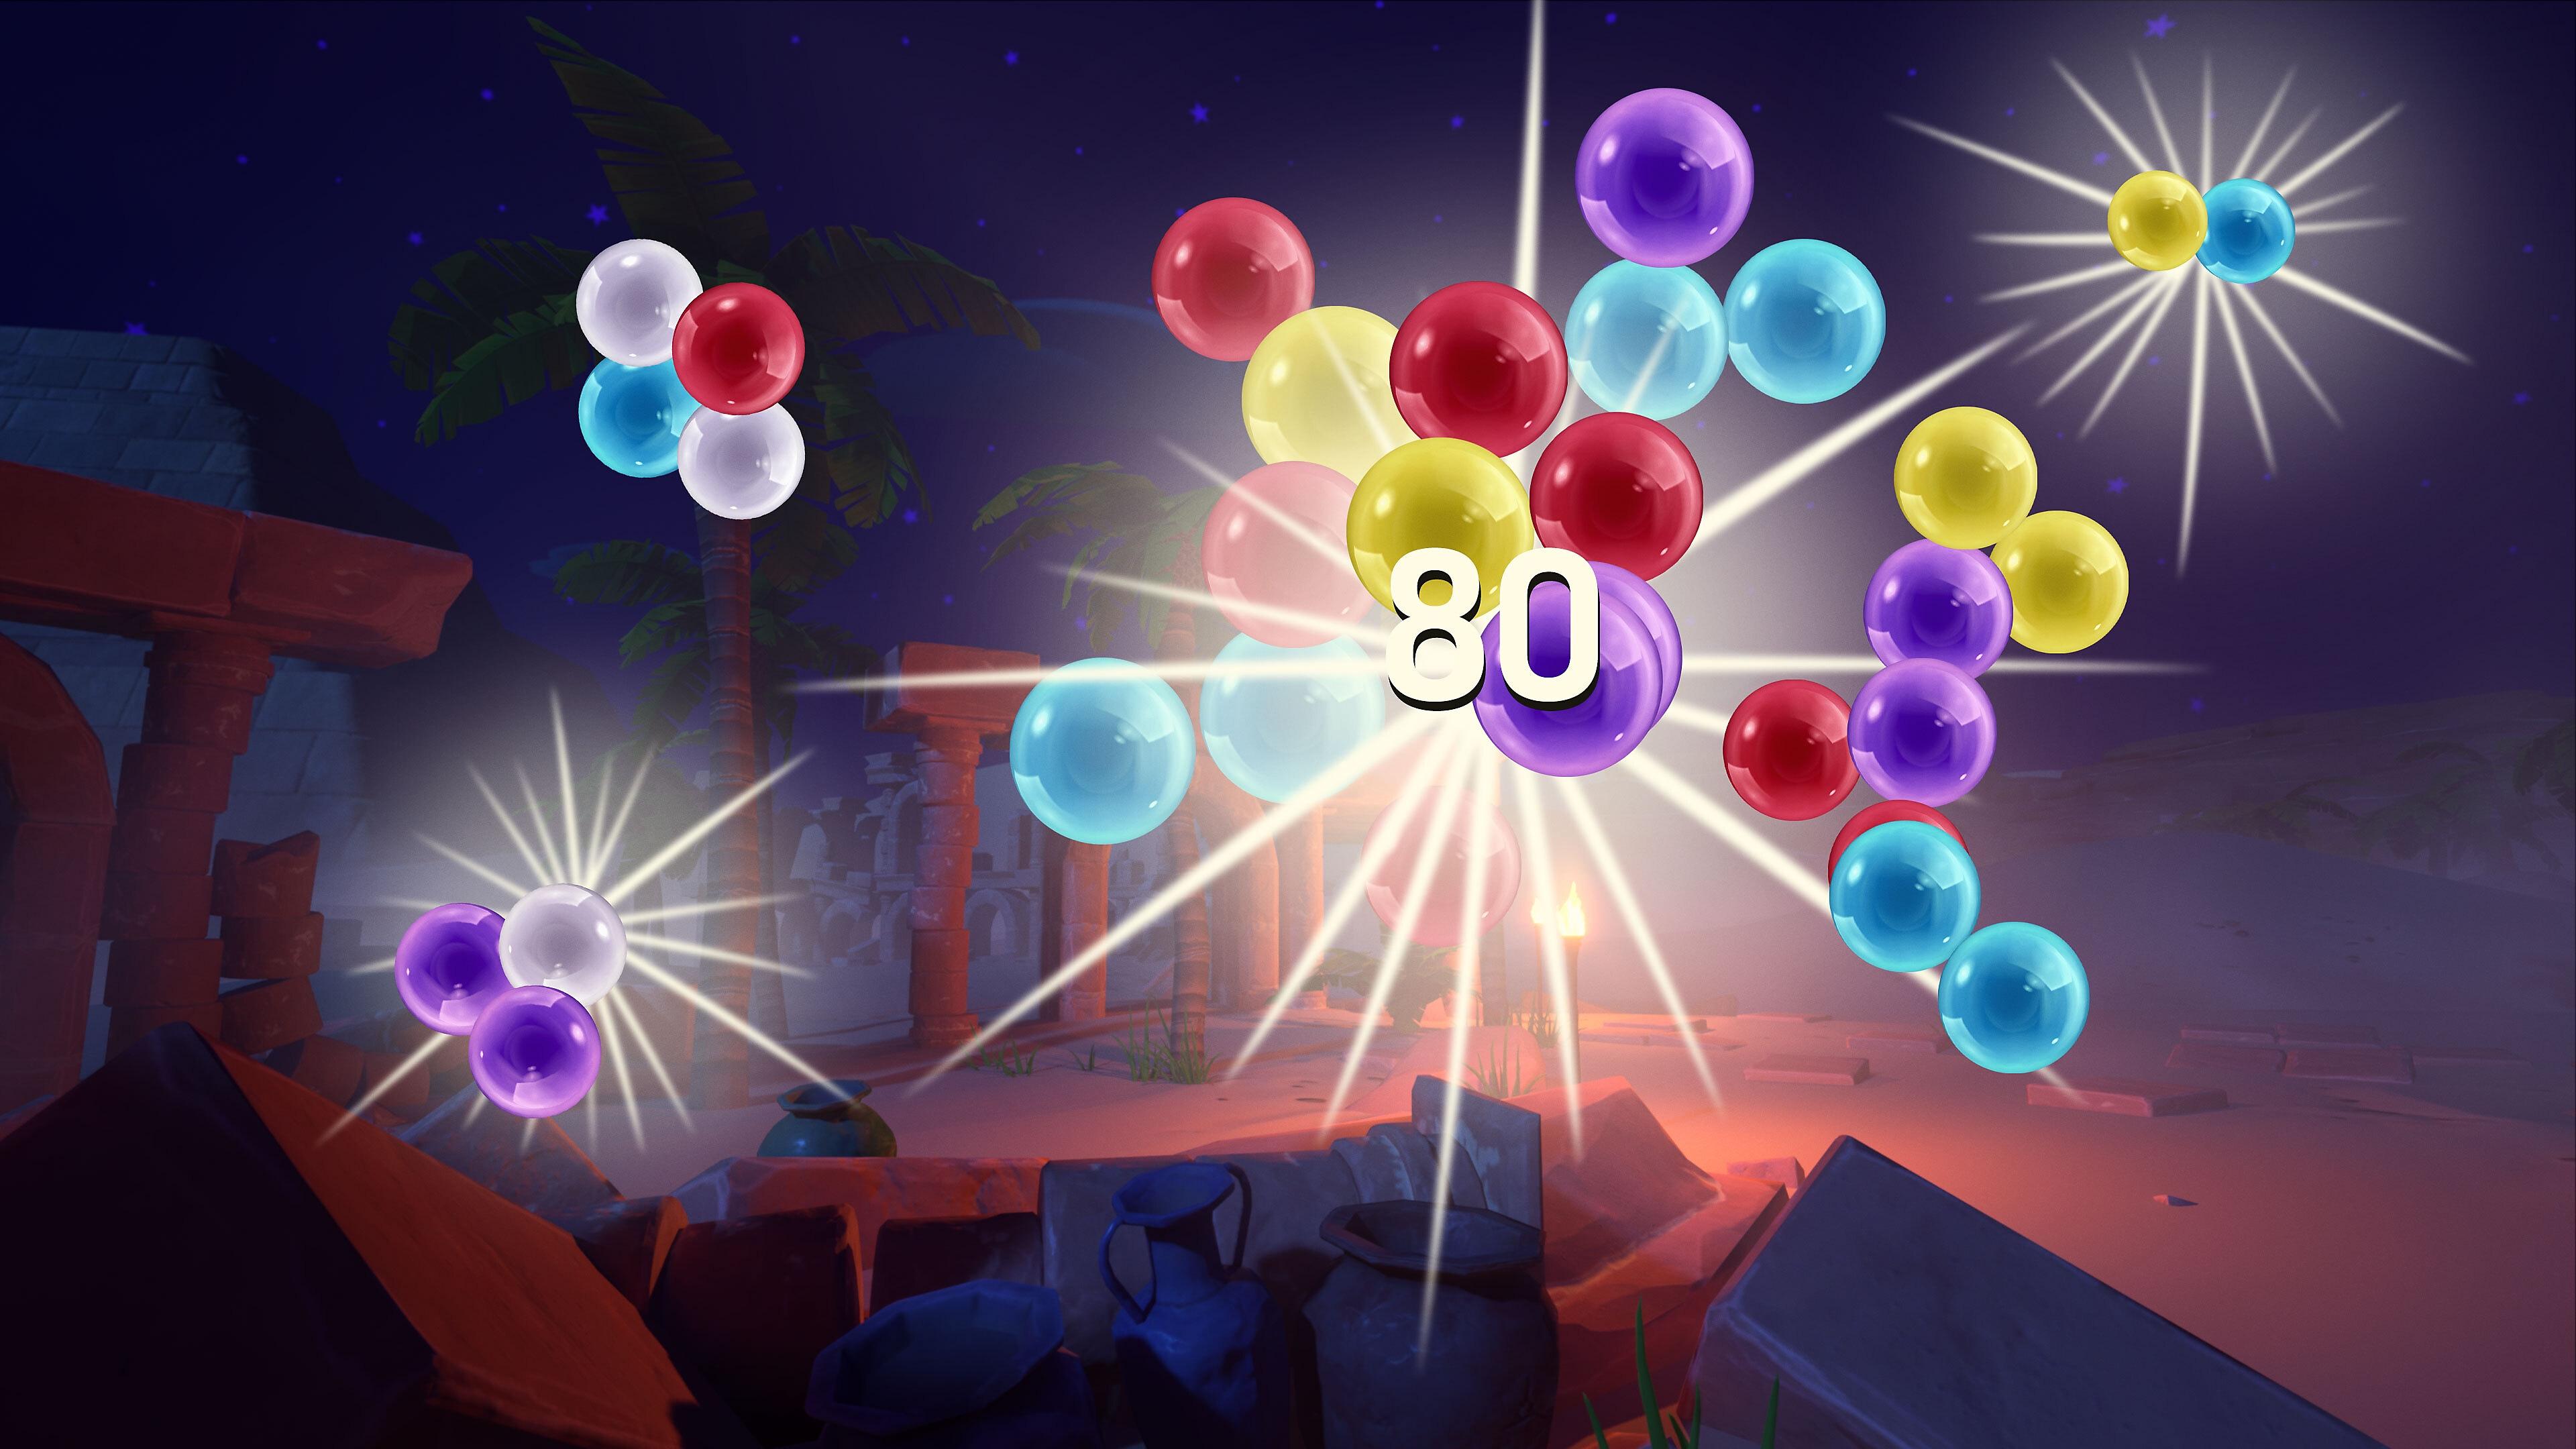 Puzzle Bobble 3D – зняток екрану для анонсу